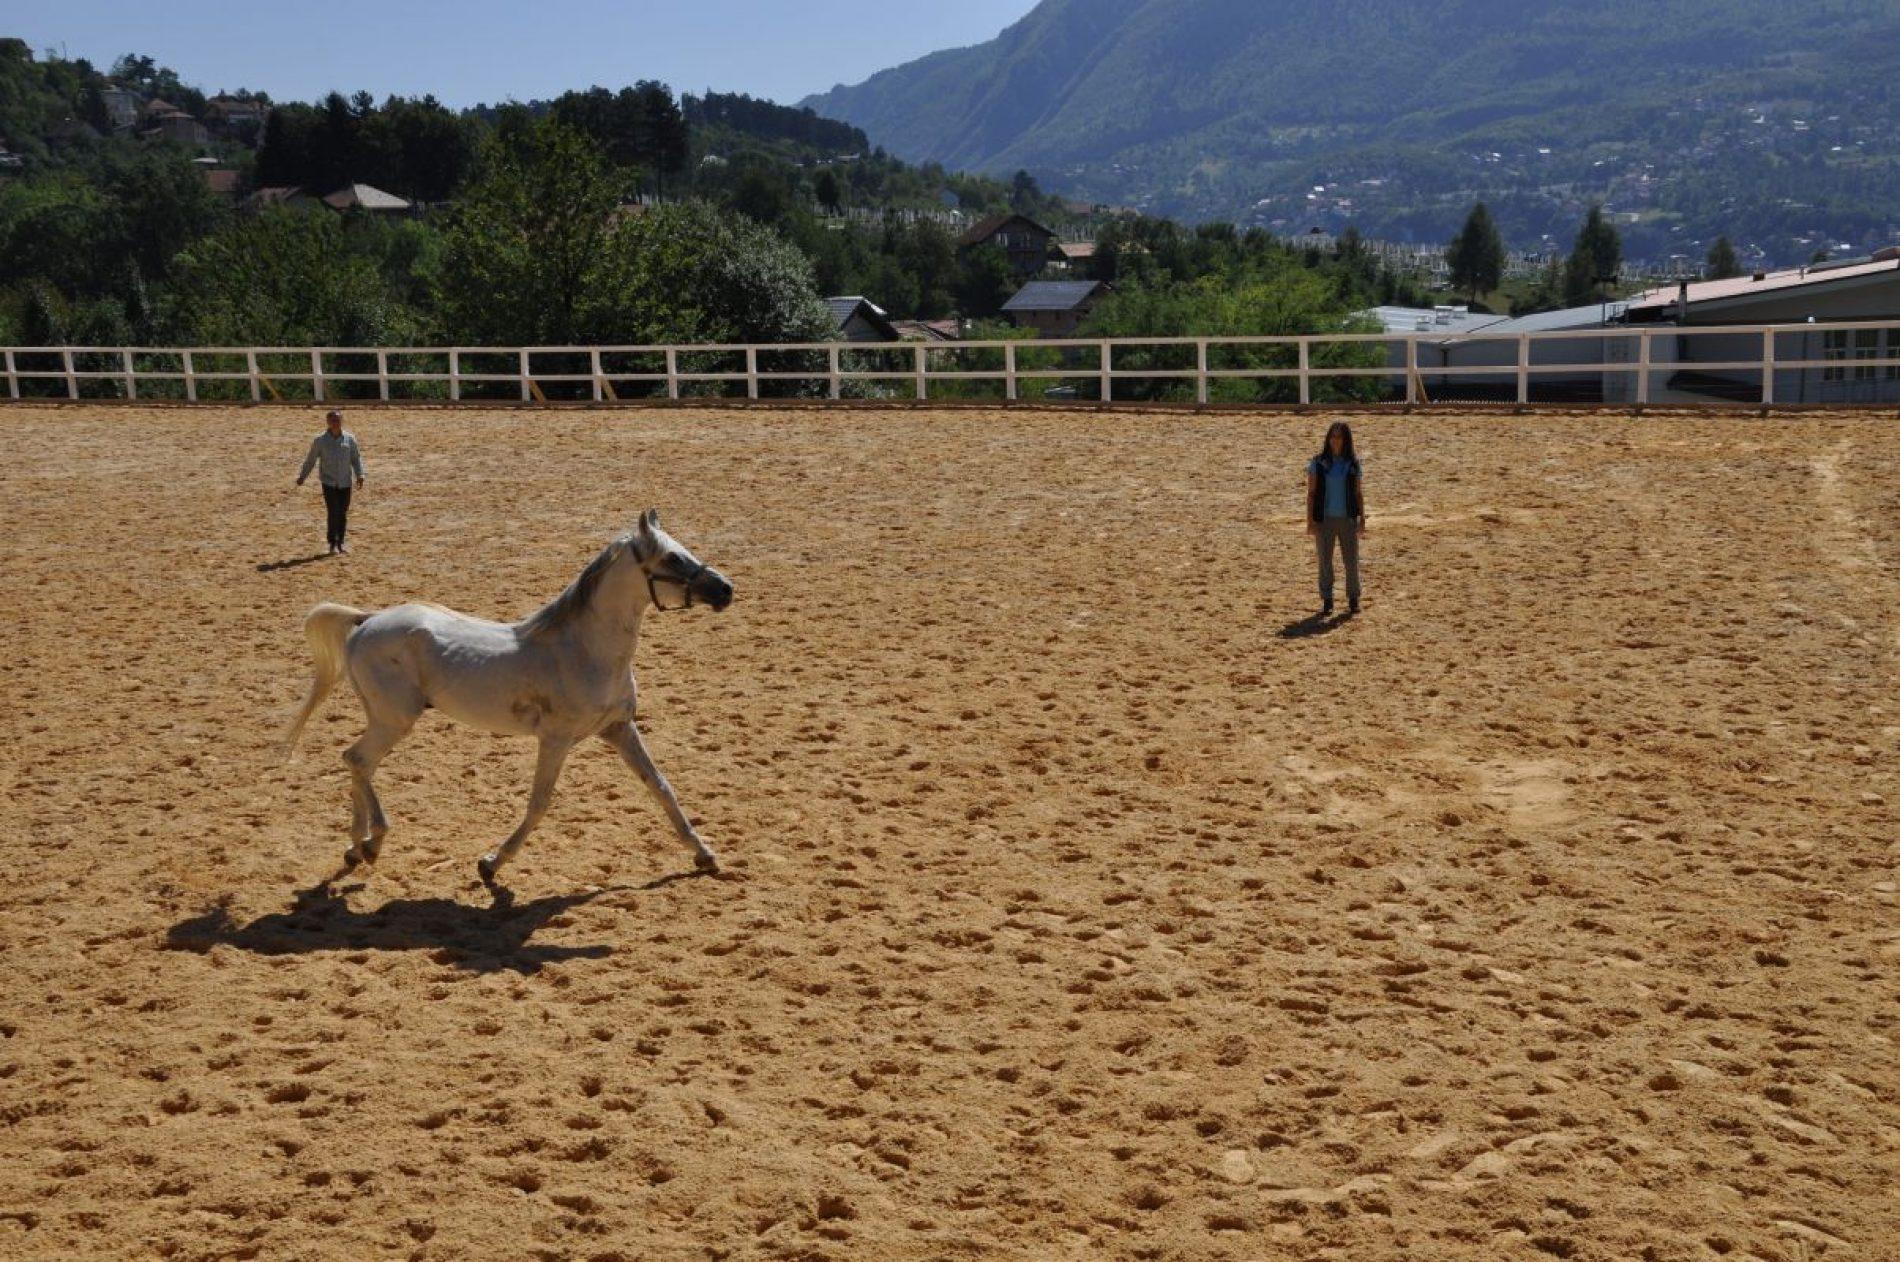 Jahanje konja nova atrakcija u Starom Gradu (FOTO)